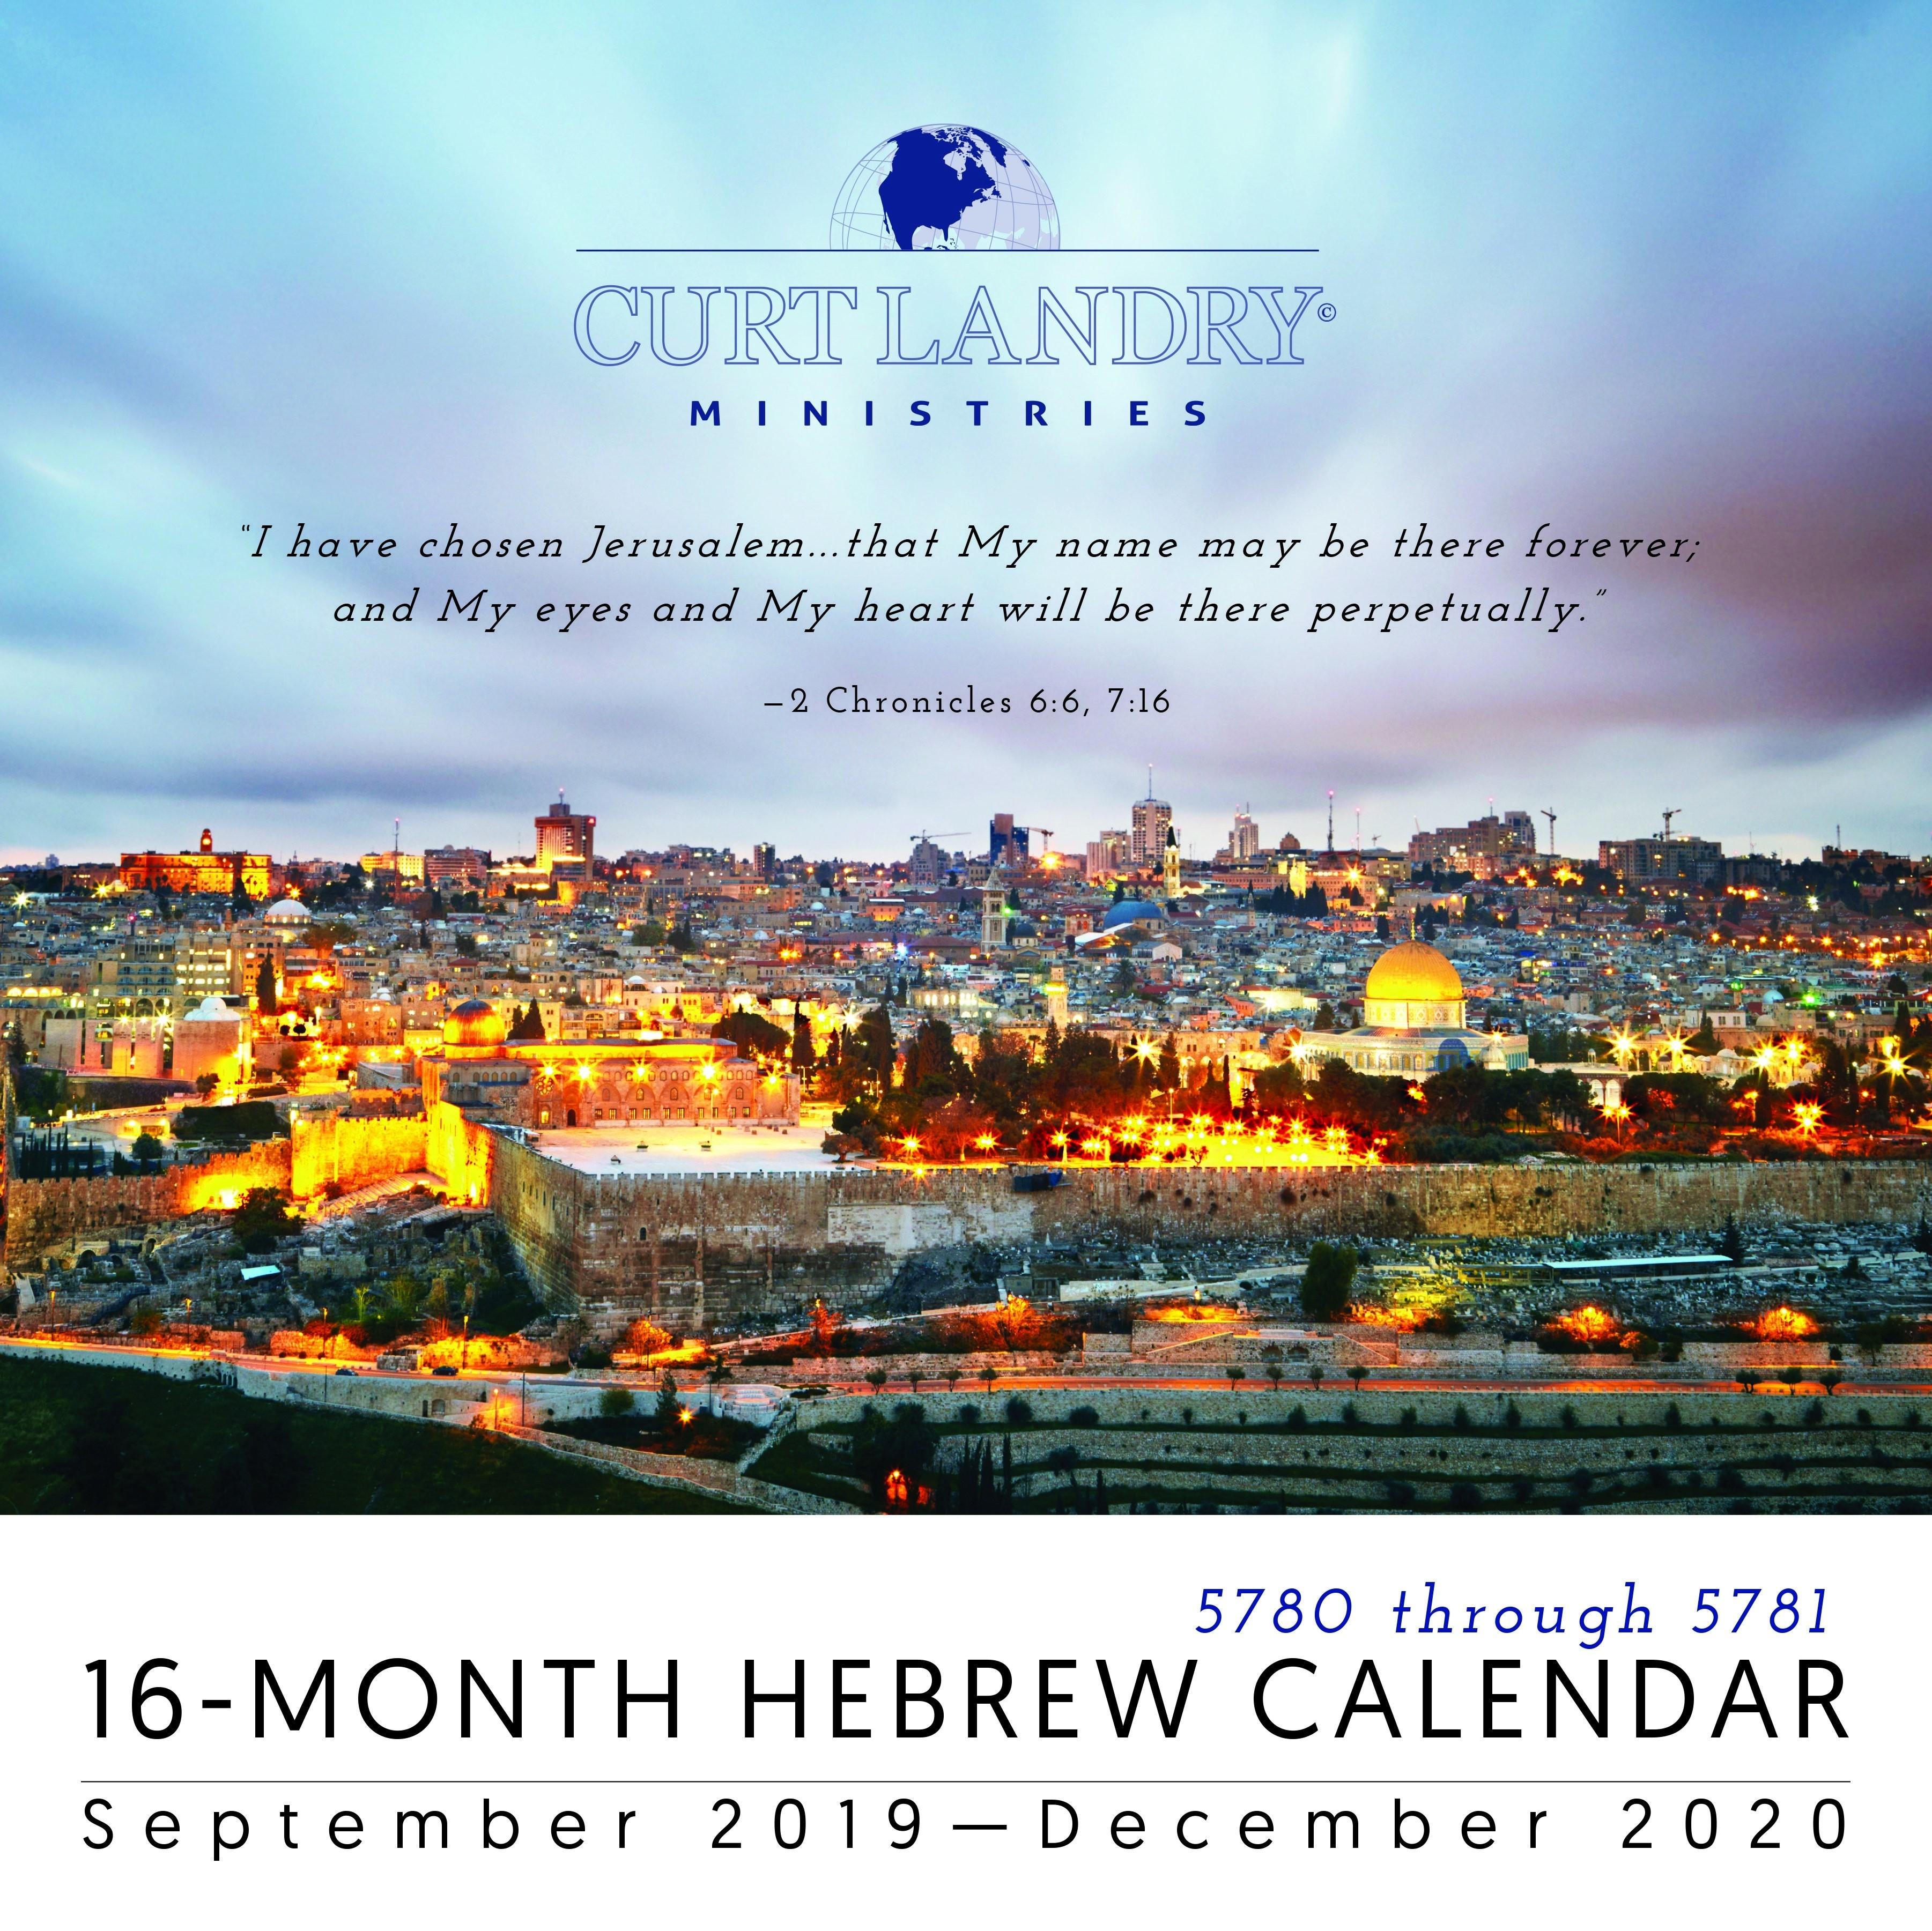 Hebrew Calendar By Curt Landry Ministries - 2019/5780 - 2020/5781-2020 Calendar With Holidays Inc Jewish